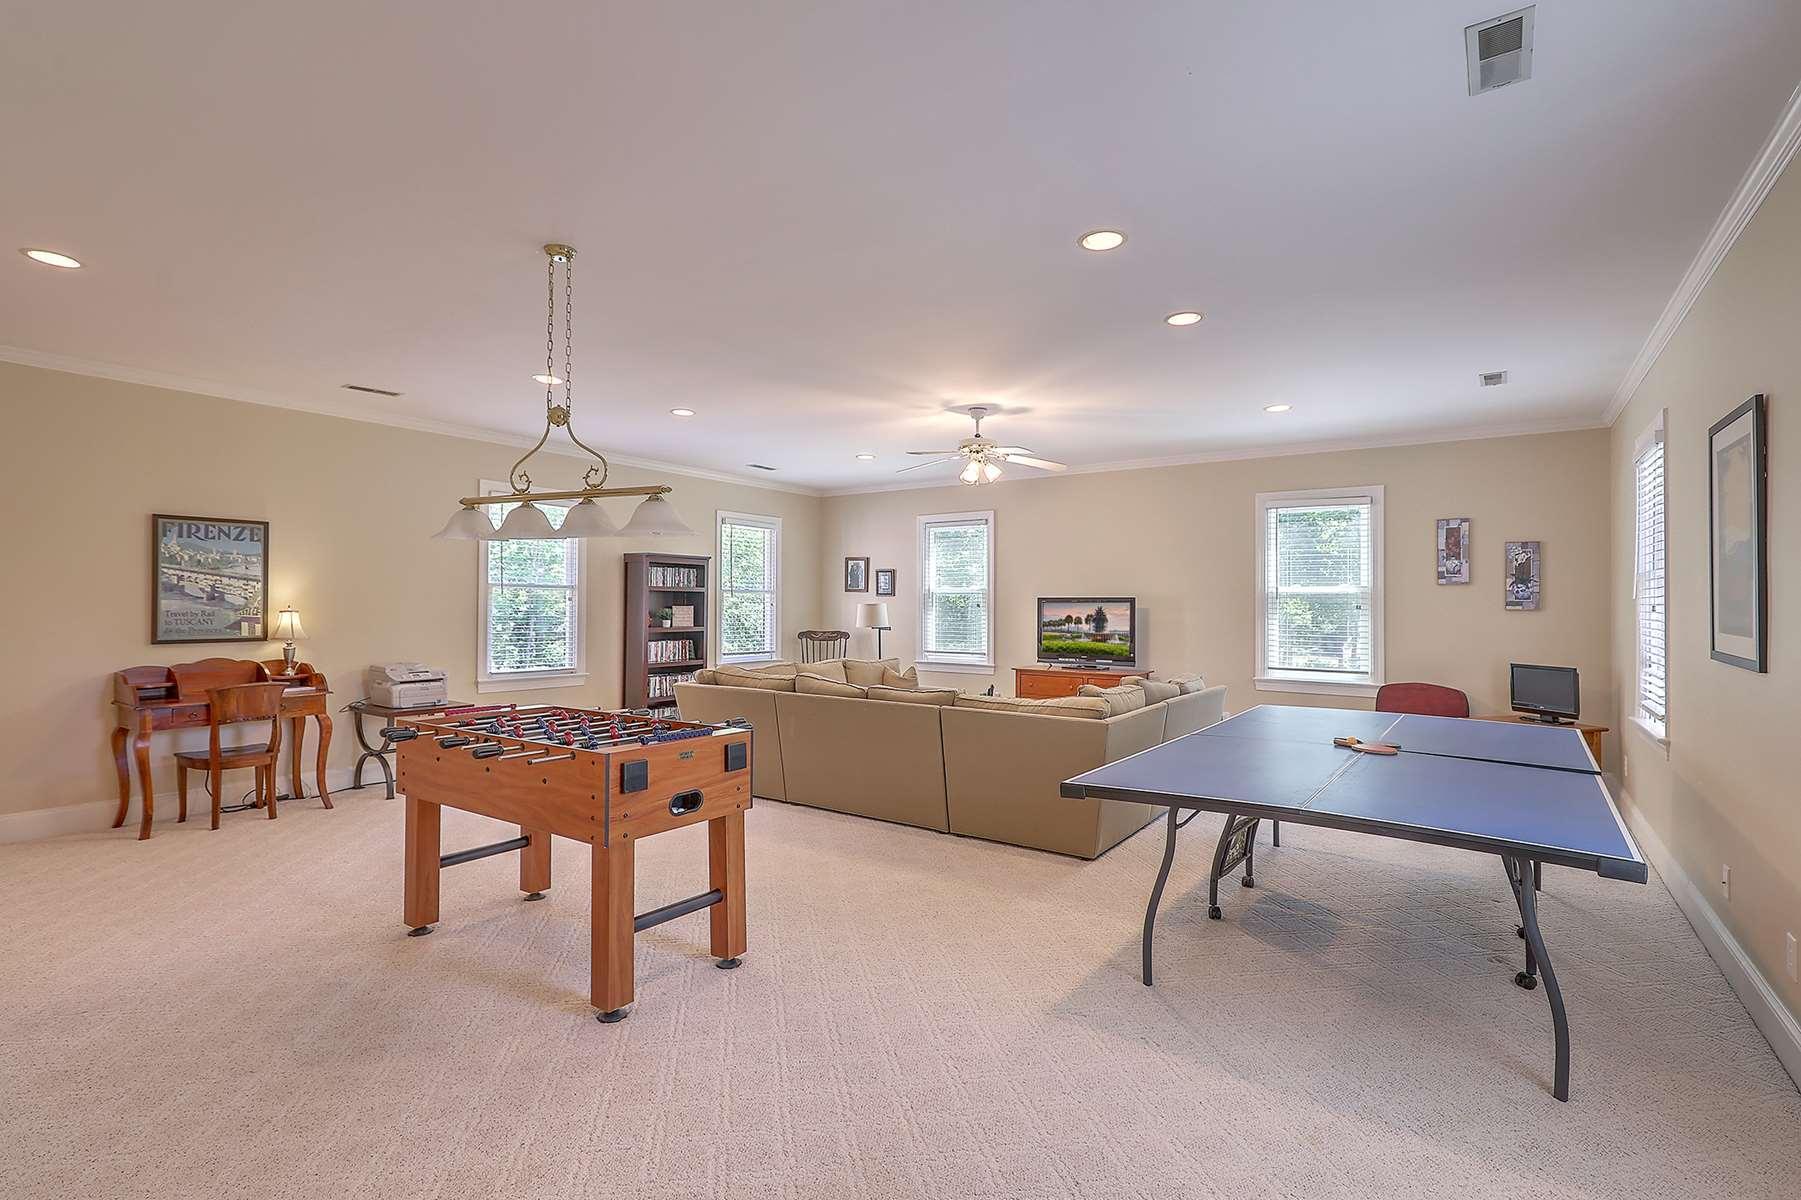 Dunes West Homes For Sale - 2961 Pignatelli, Mount Pleasant, SC - 18